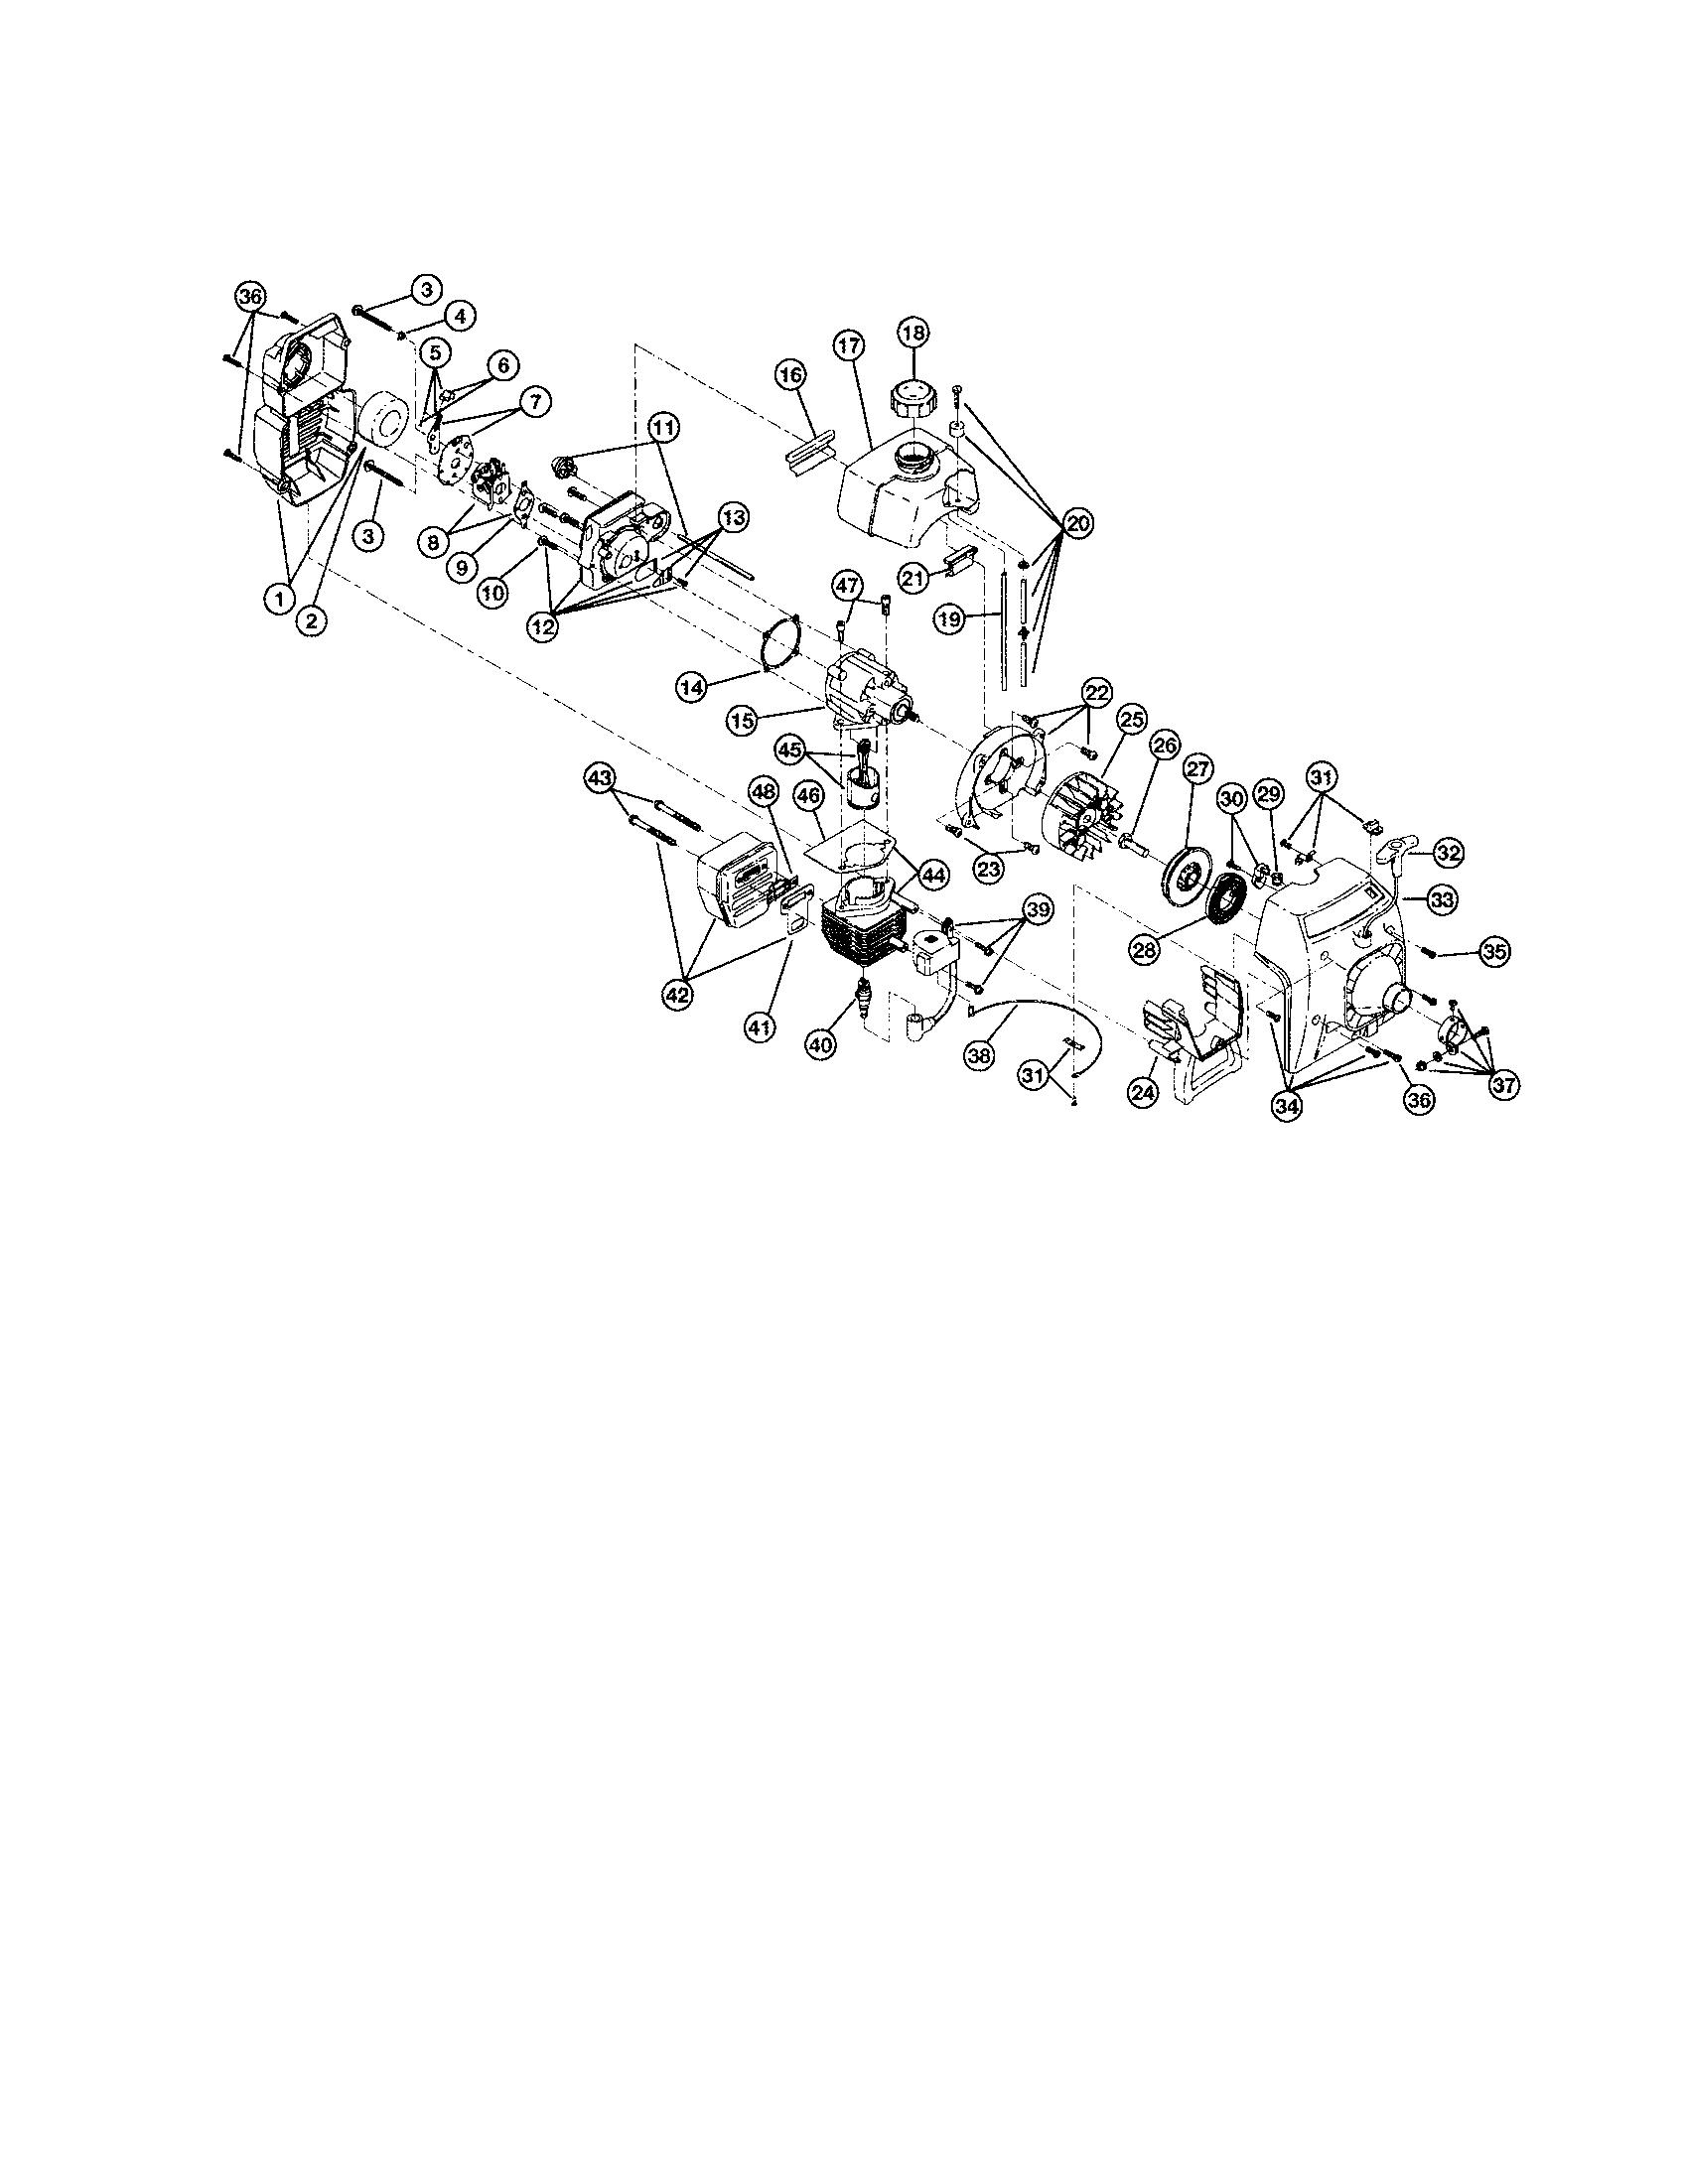 hight resolution of ryobi engine diagram